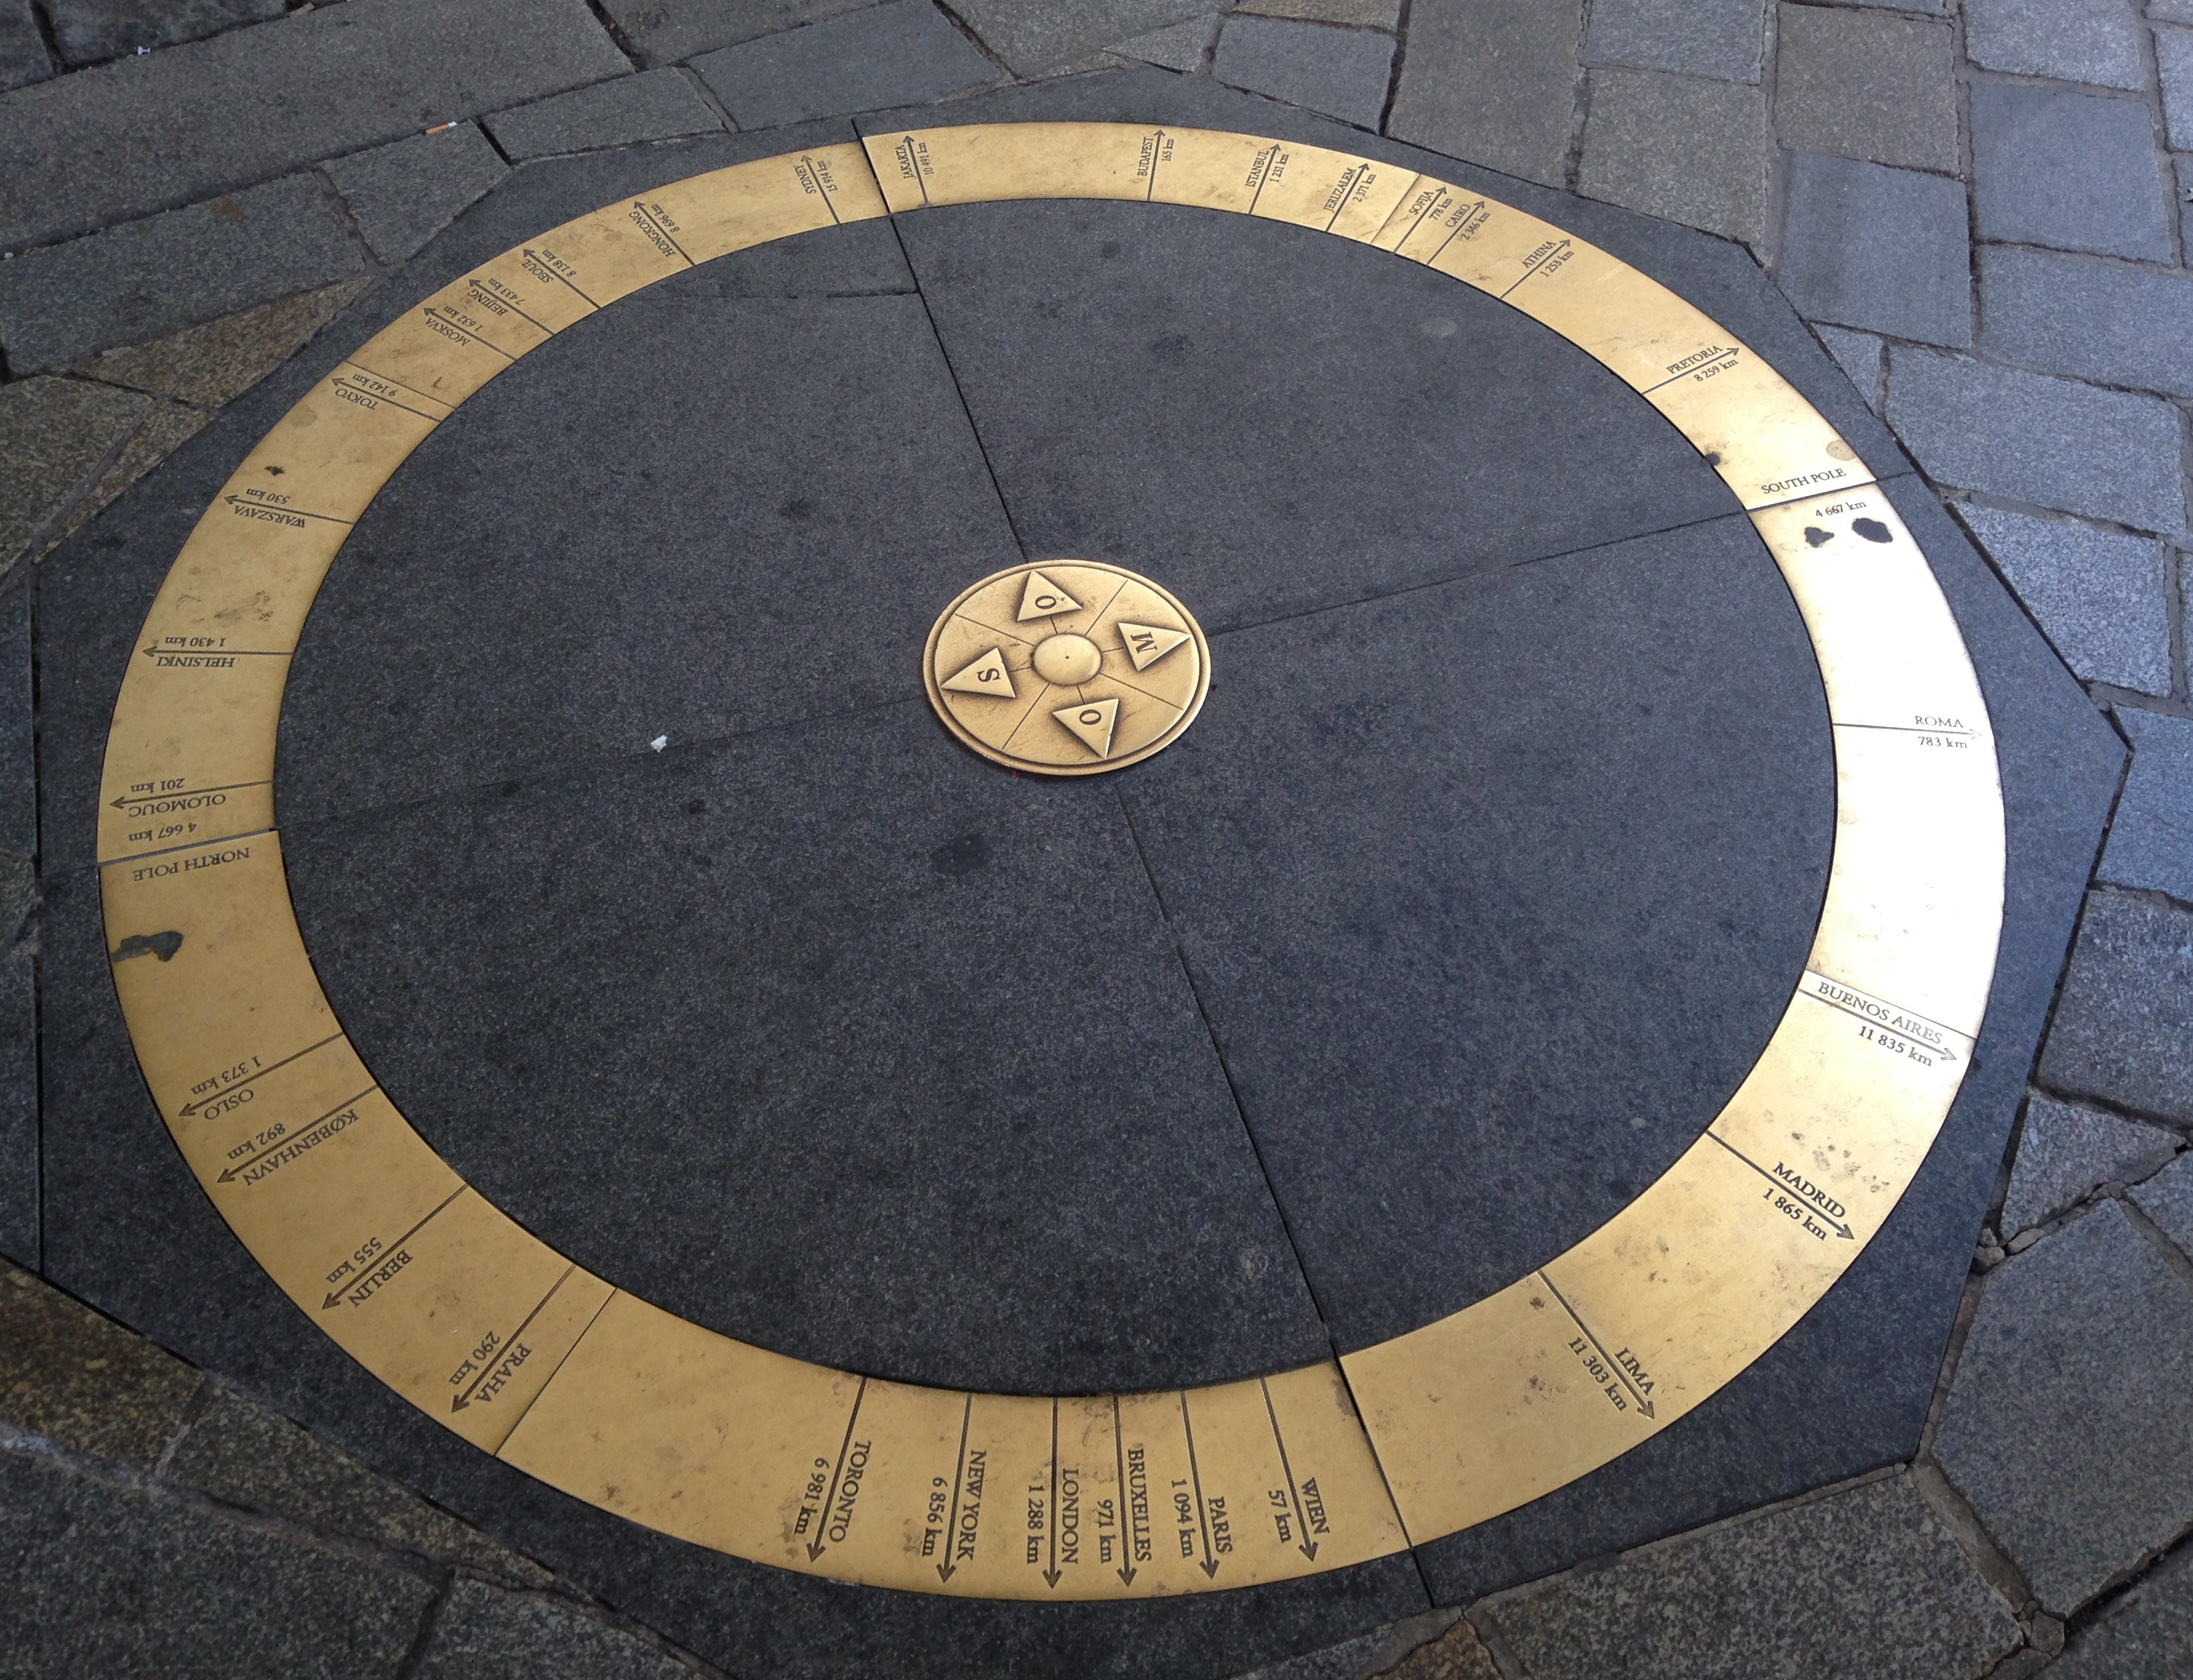 Filekilometre Zero Km 0 Of Slovakia In Bratislavajpg Wikimedia